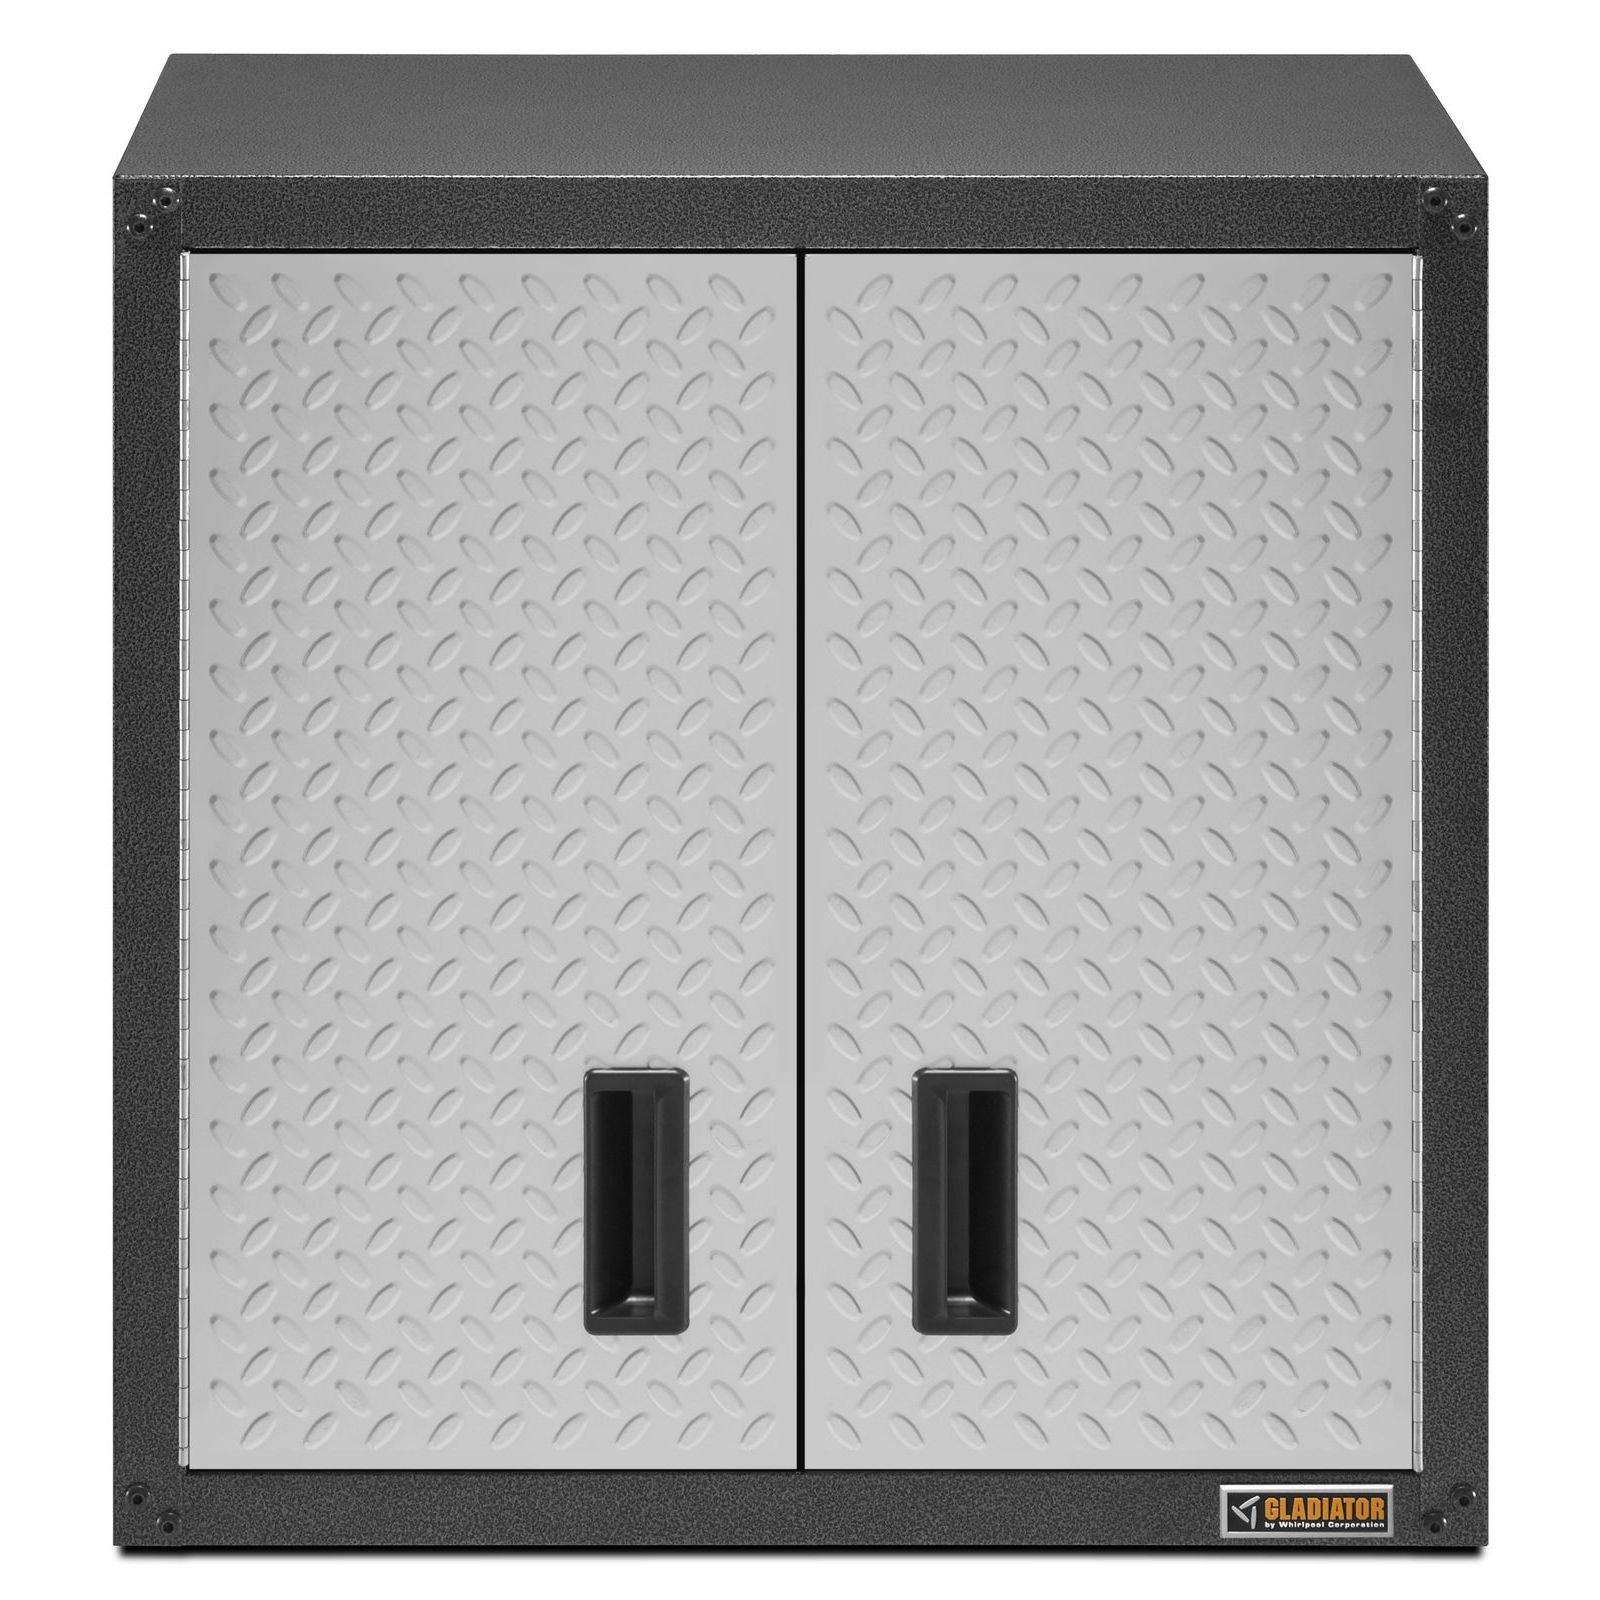 Gladiator GAWG28FDYG Full Door Wall Box EZ RTA by Gladiator